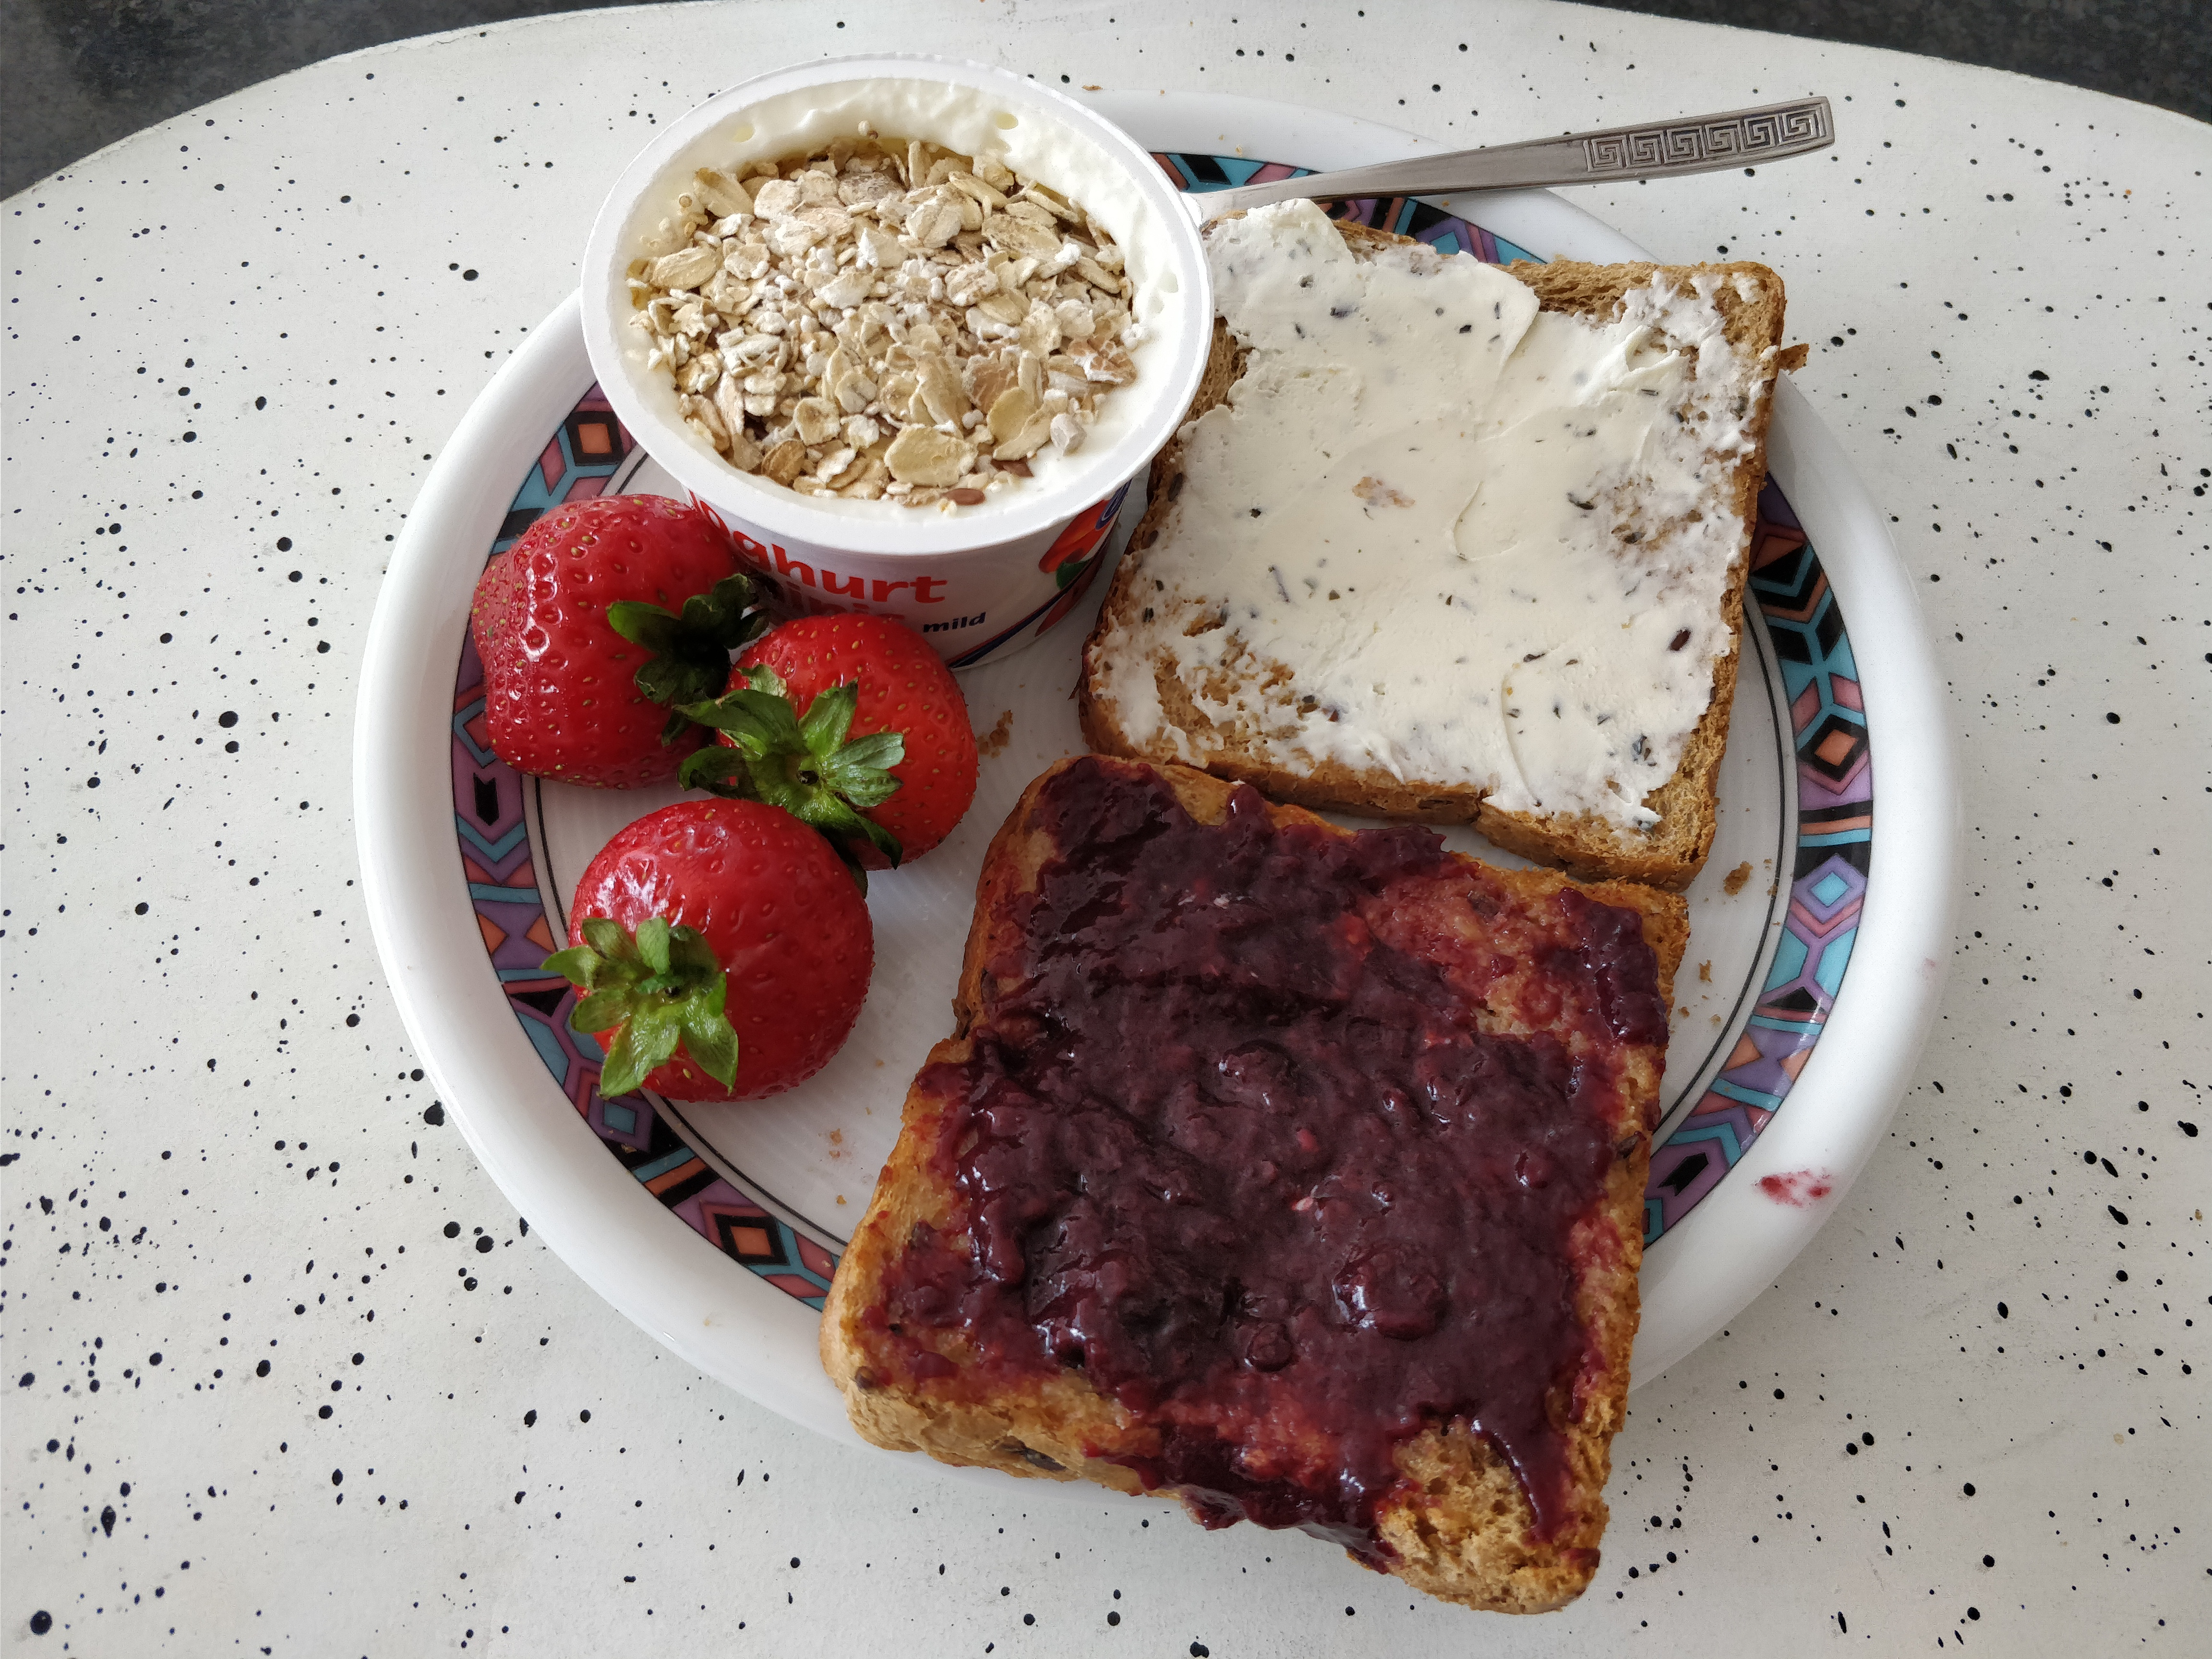 http://foodloader.net/nico_2017-08-19_toast-und-joghurt.jpg